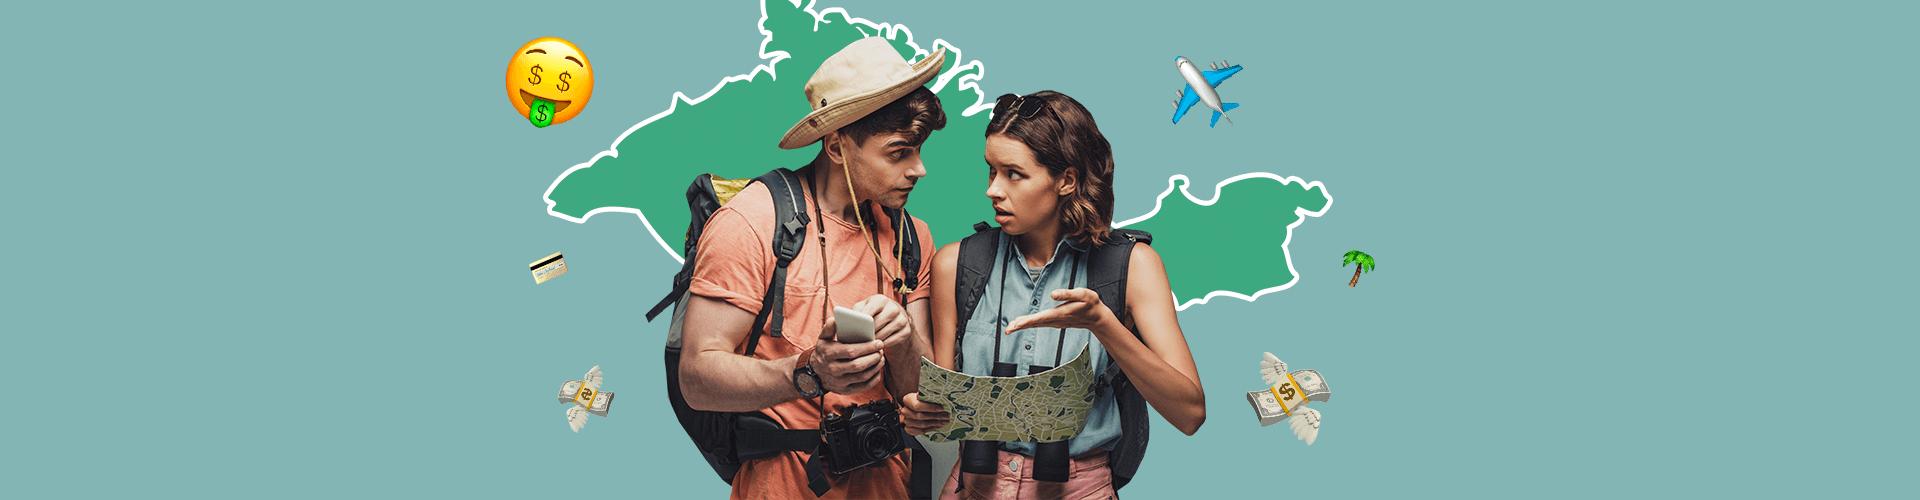 крым, путешествие, деньги, пара, туристы